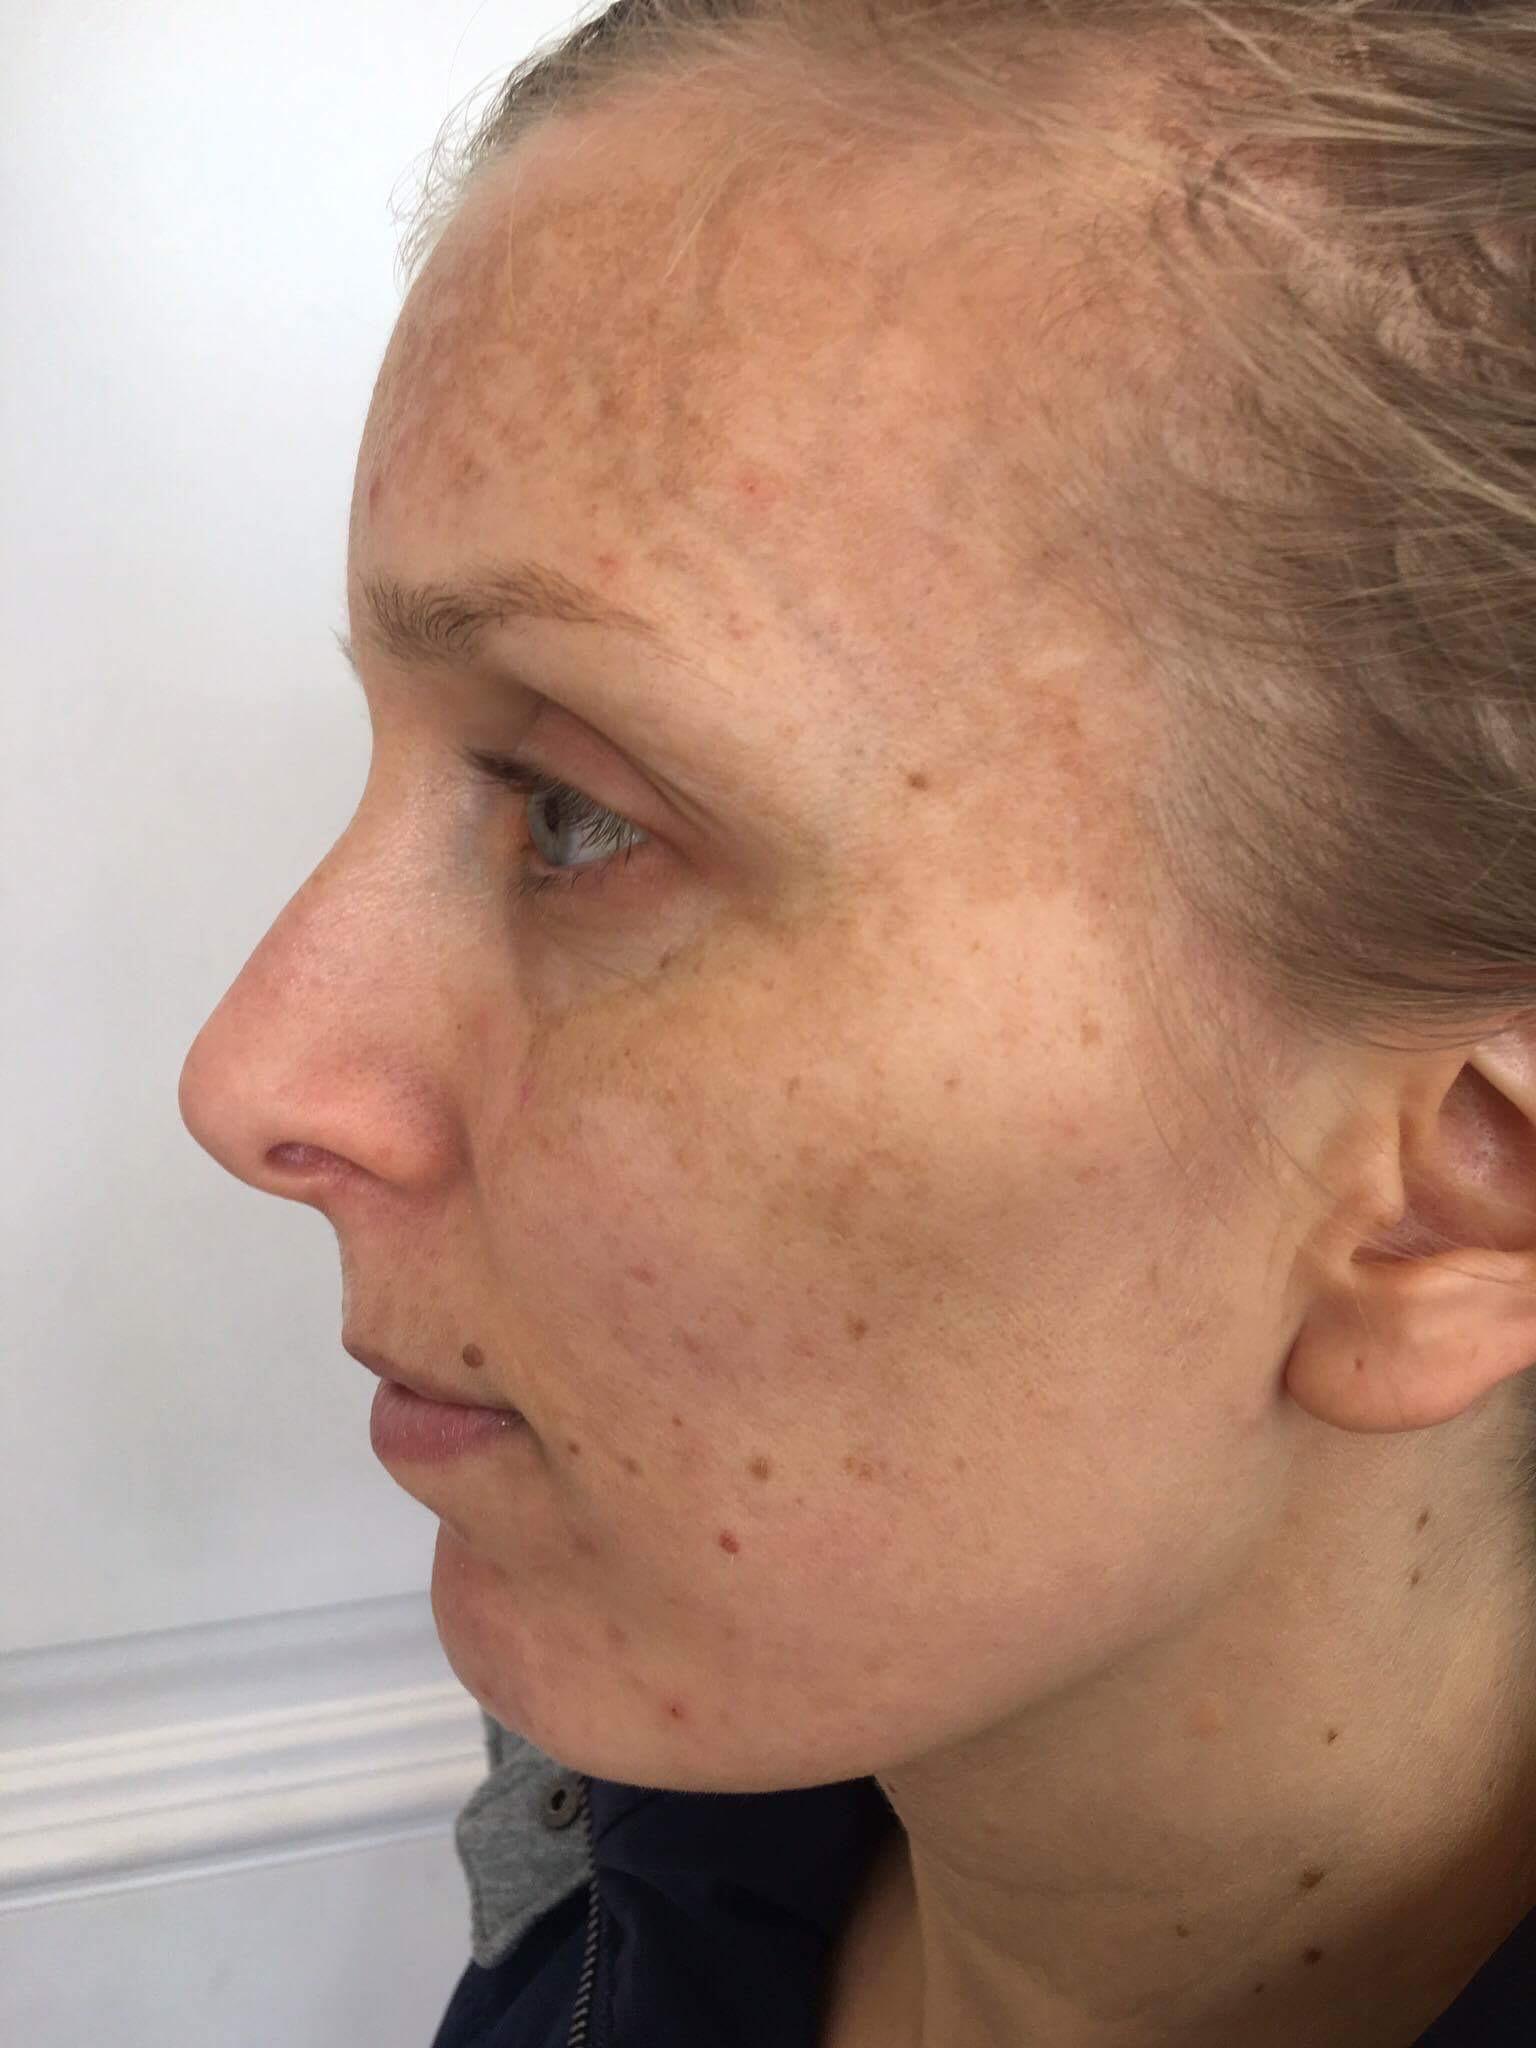 melasma cosmelan dermamelan depigmentation skin treatment